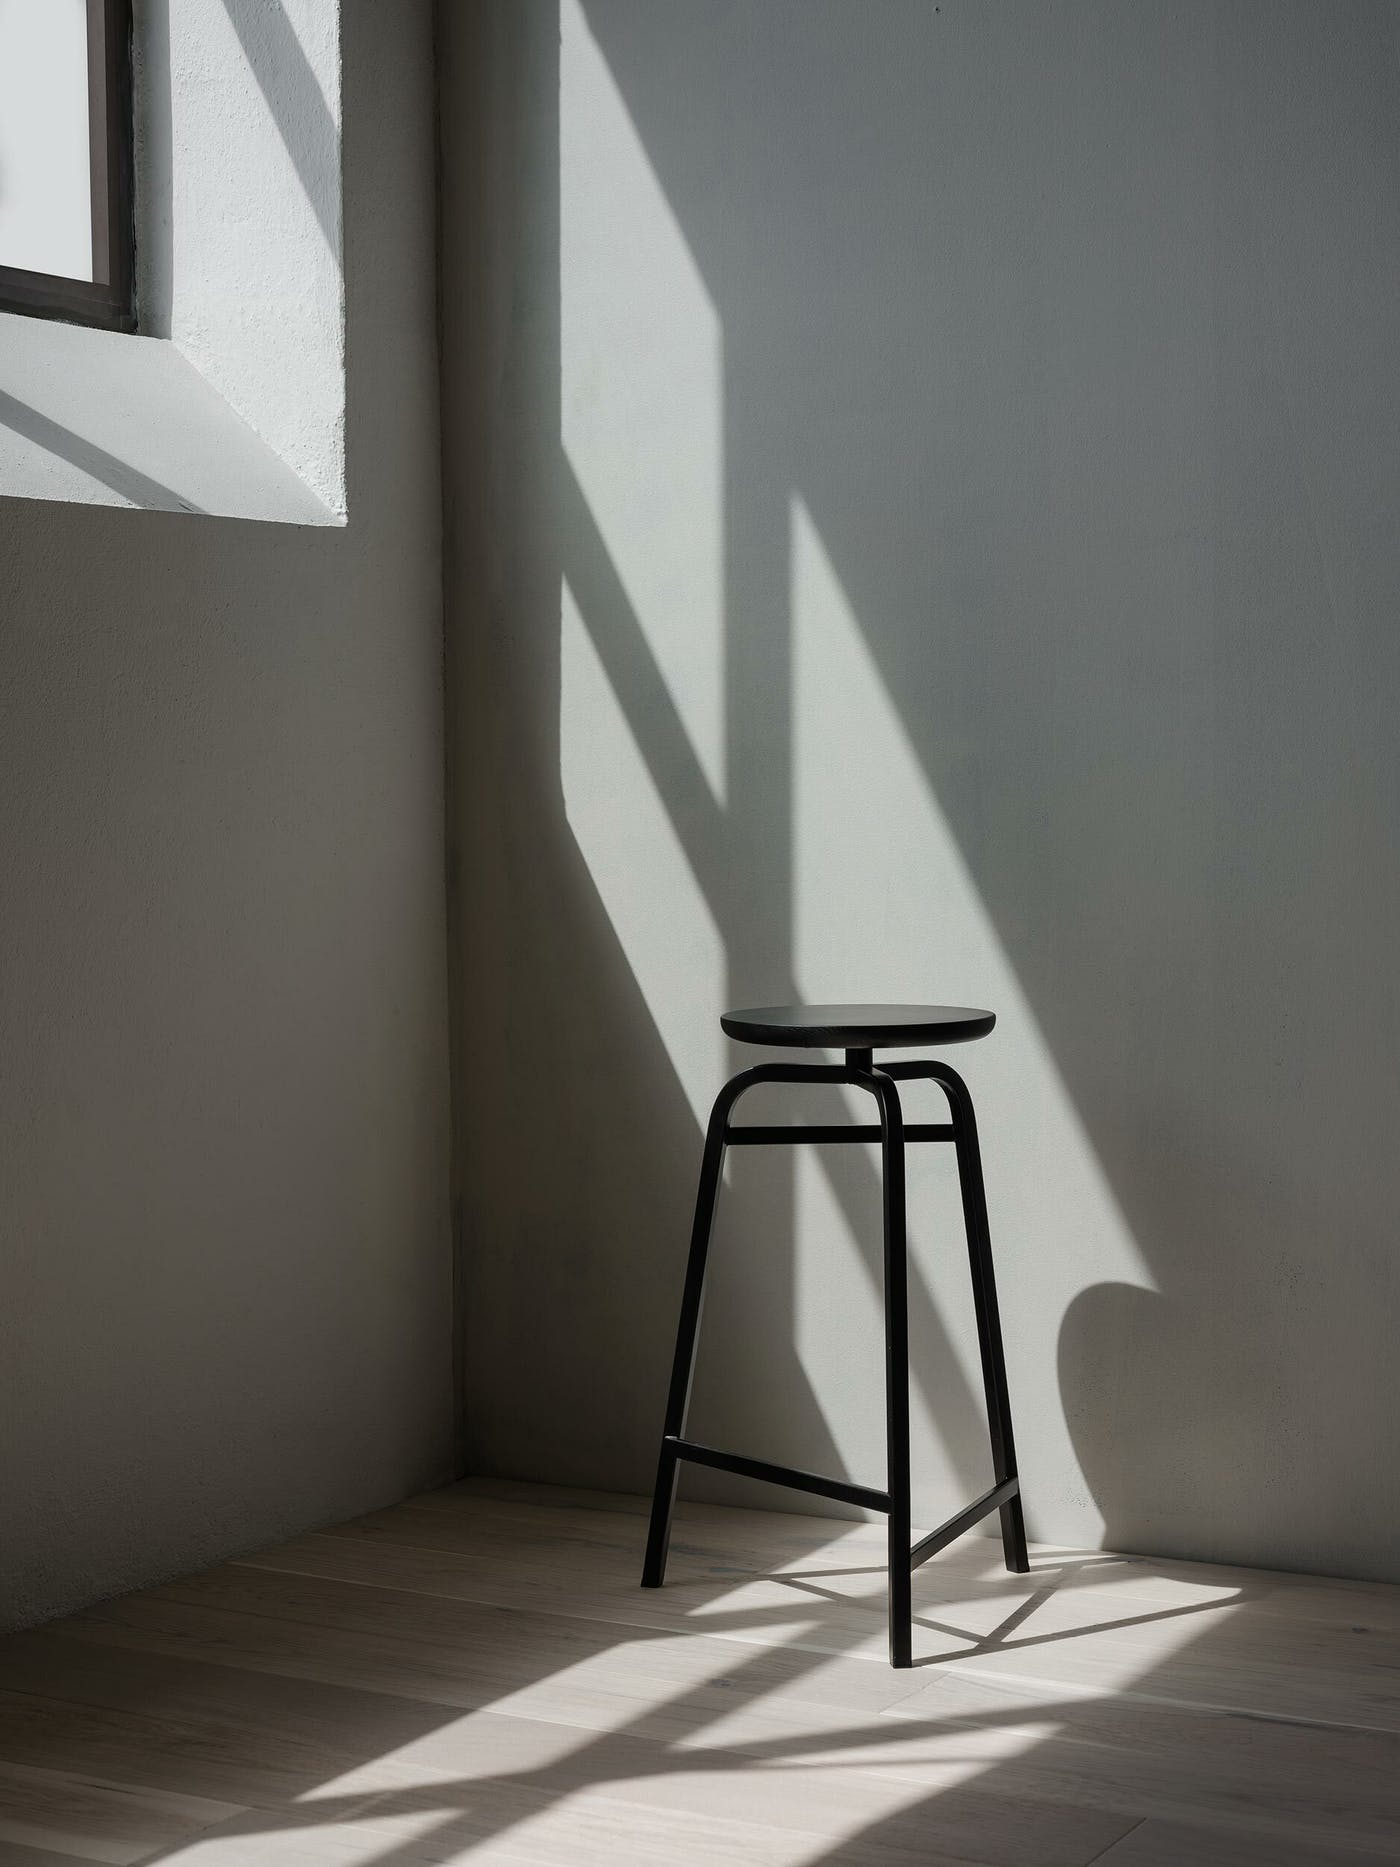 Treble bar stool black corner Northern Photo Einar Aslaksen Low res